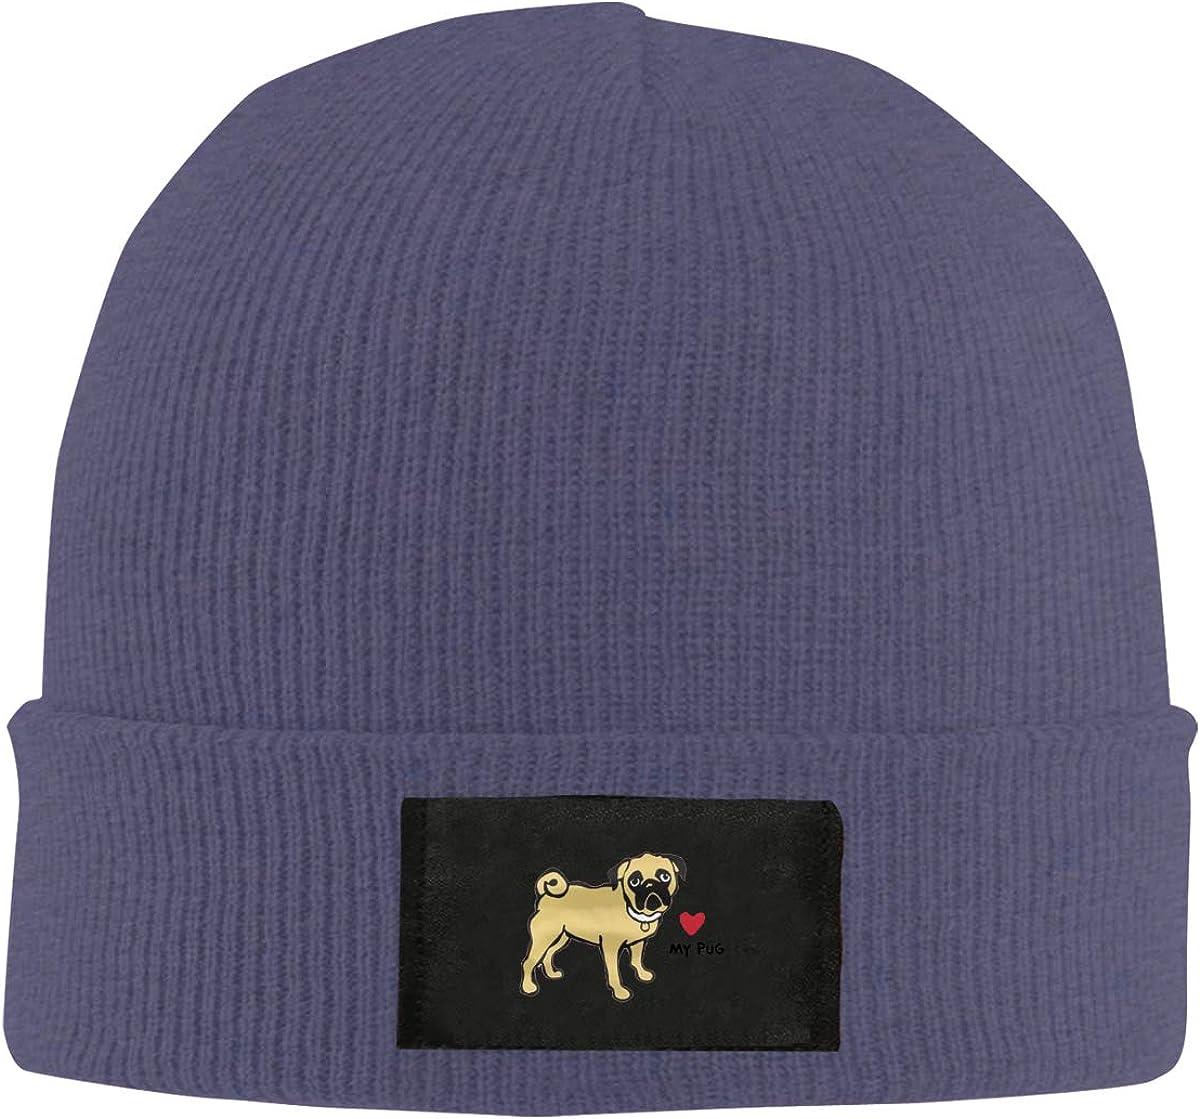 Unisex Stylish Slouch Beanie Hats Black Pug Love Top Level Beanie Men Women